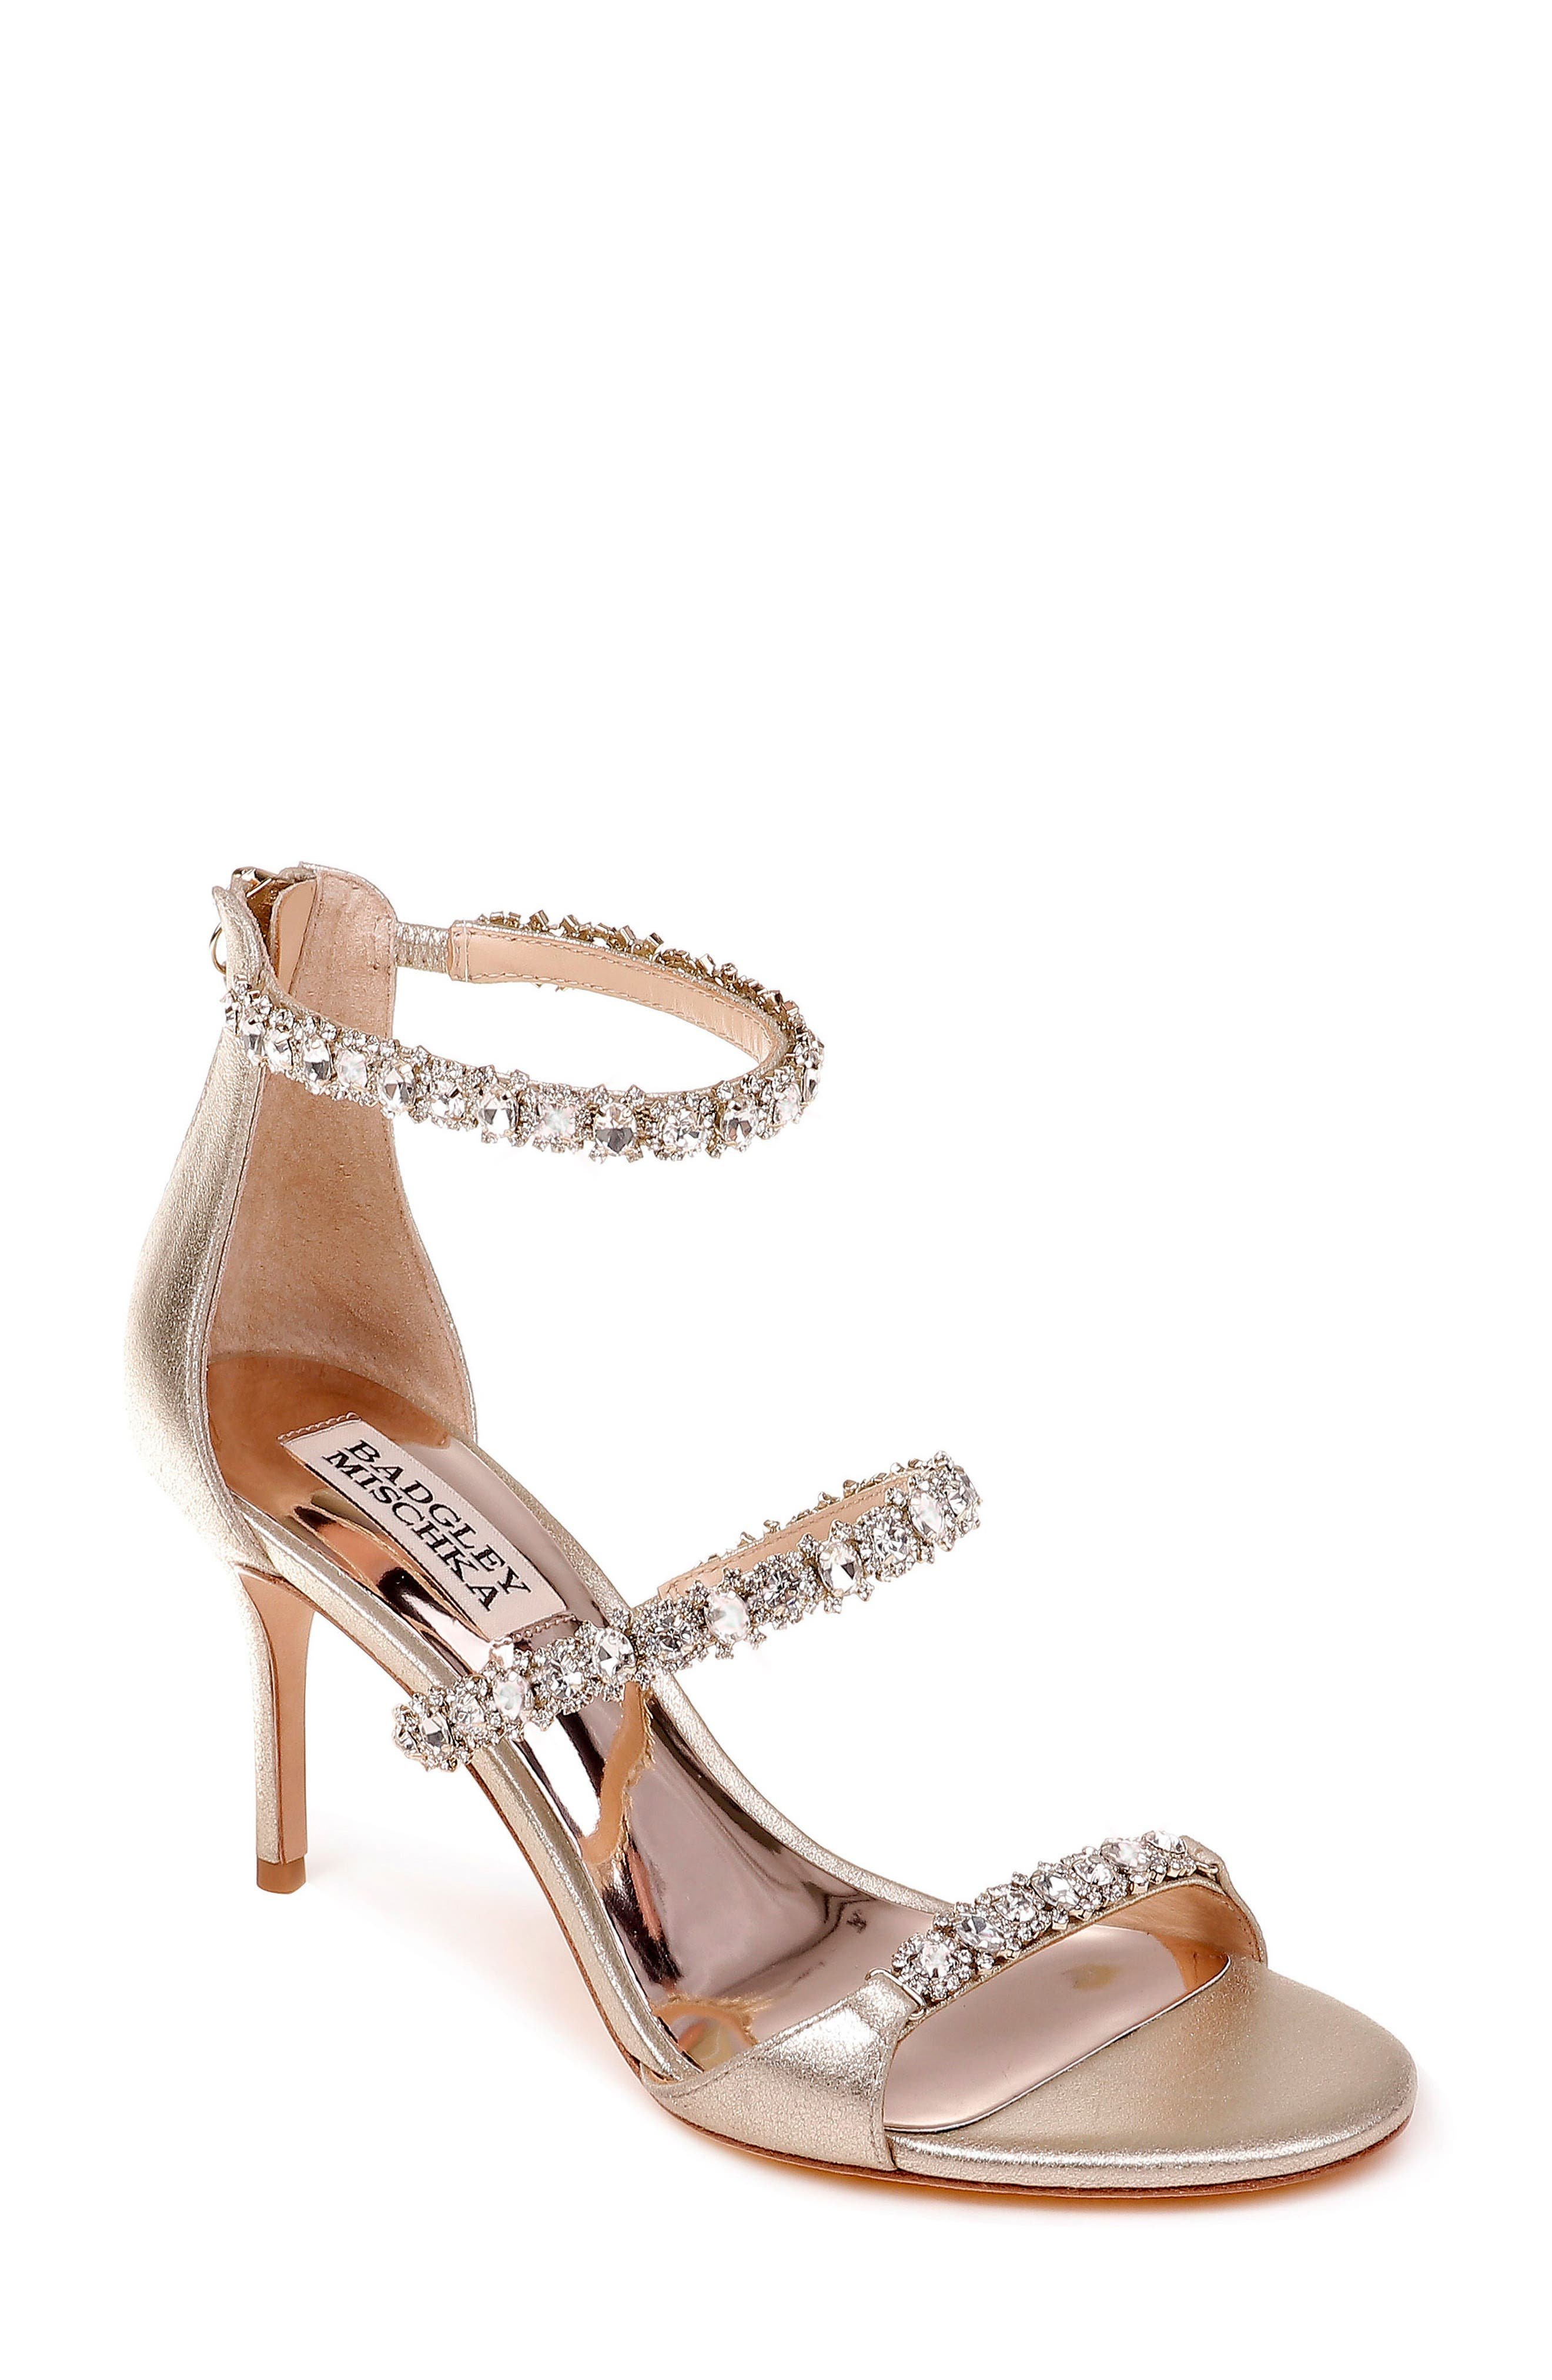 Yasmine Crystal Embellished Sandal,                             Main thumbnail 1, color,                             Latte Satin